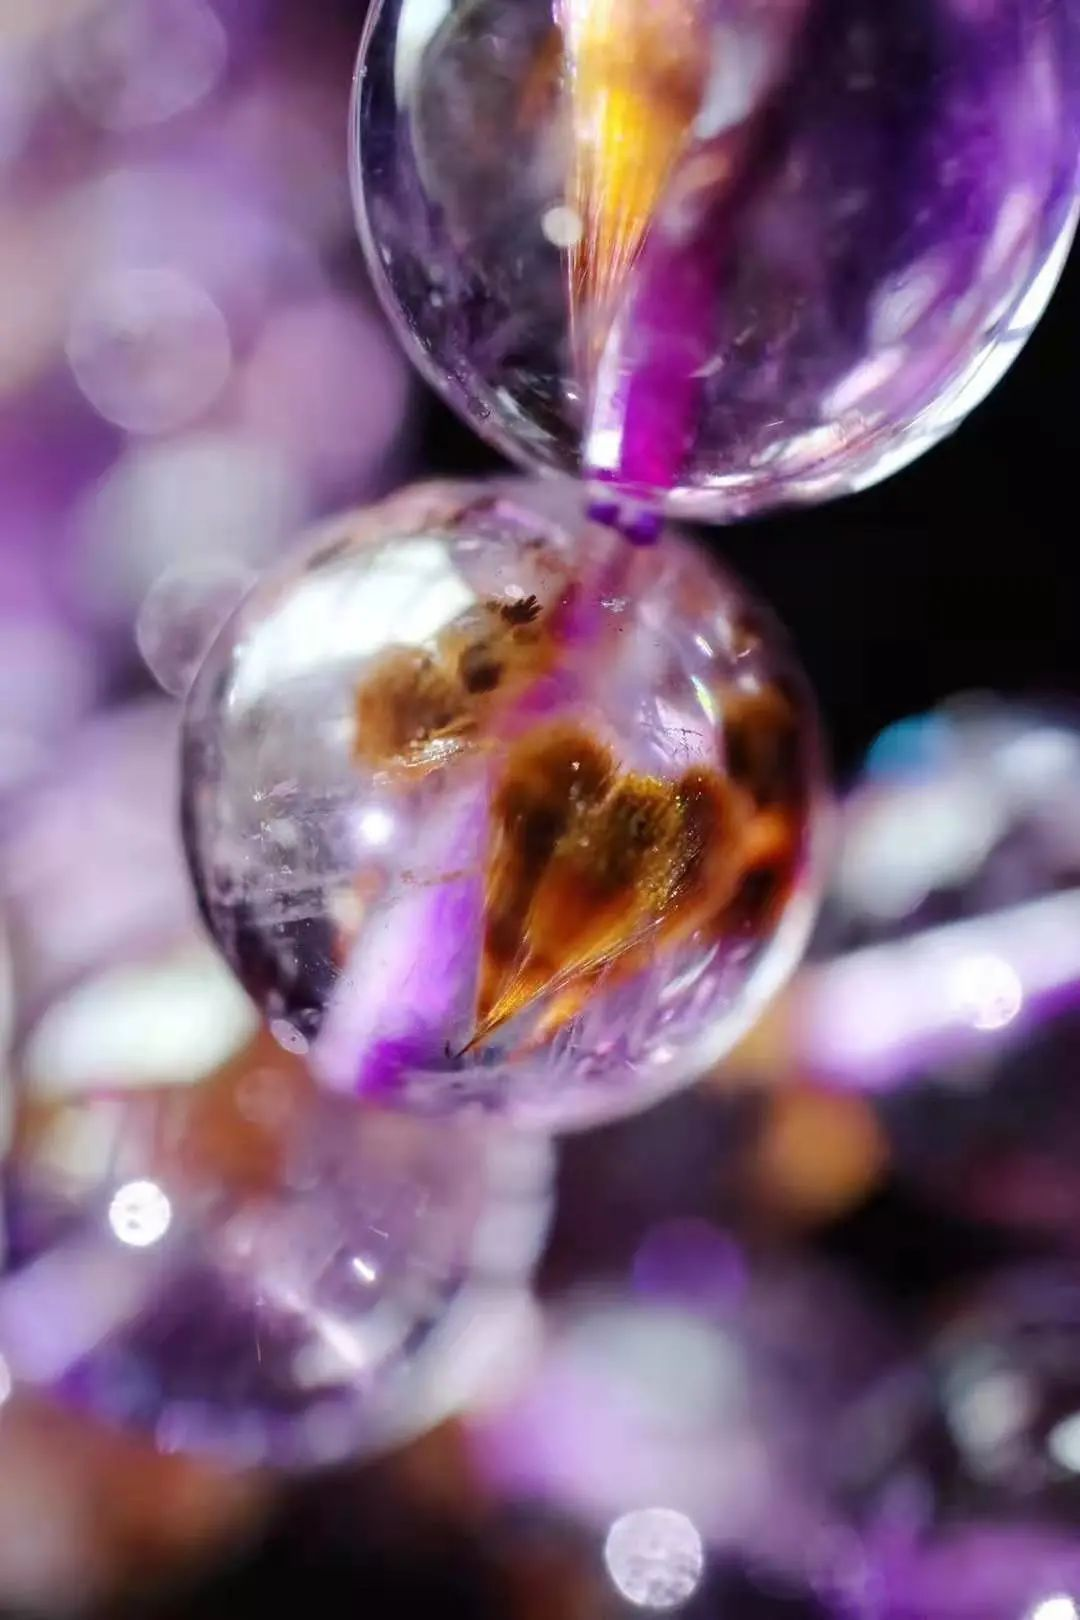 resize,m fill,h 1620,w 1080 - 紫钛晶是什么?佩戴紫钛晶有什么功效寓意?